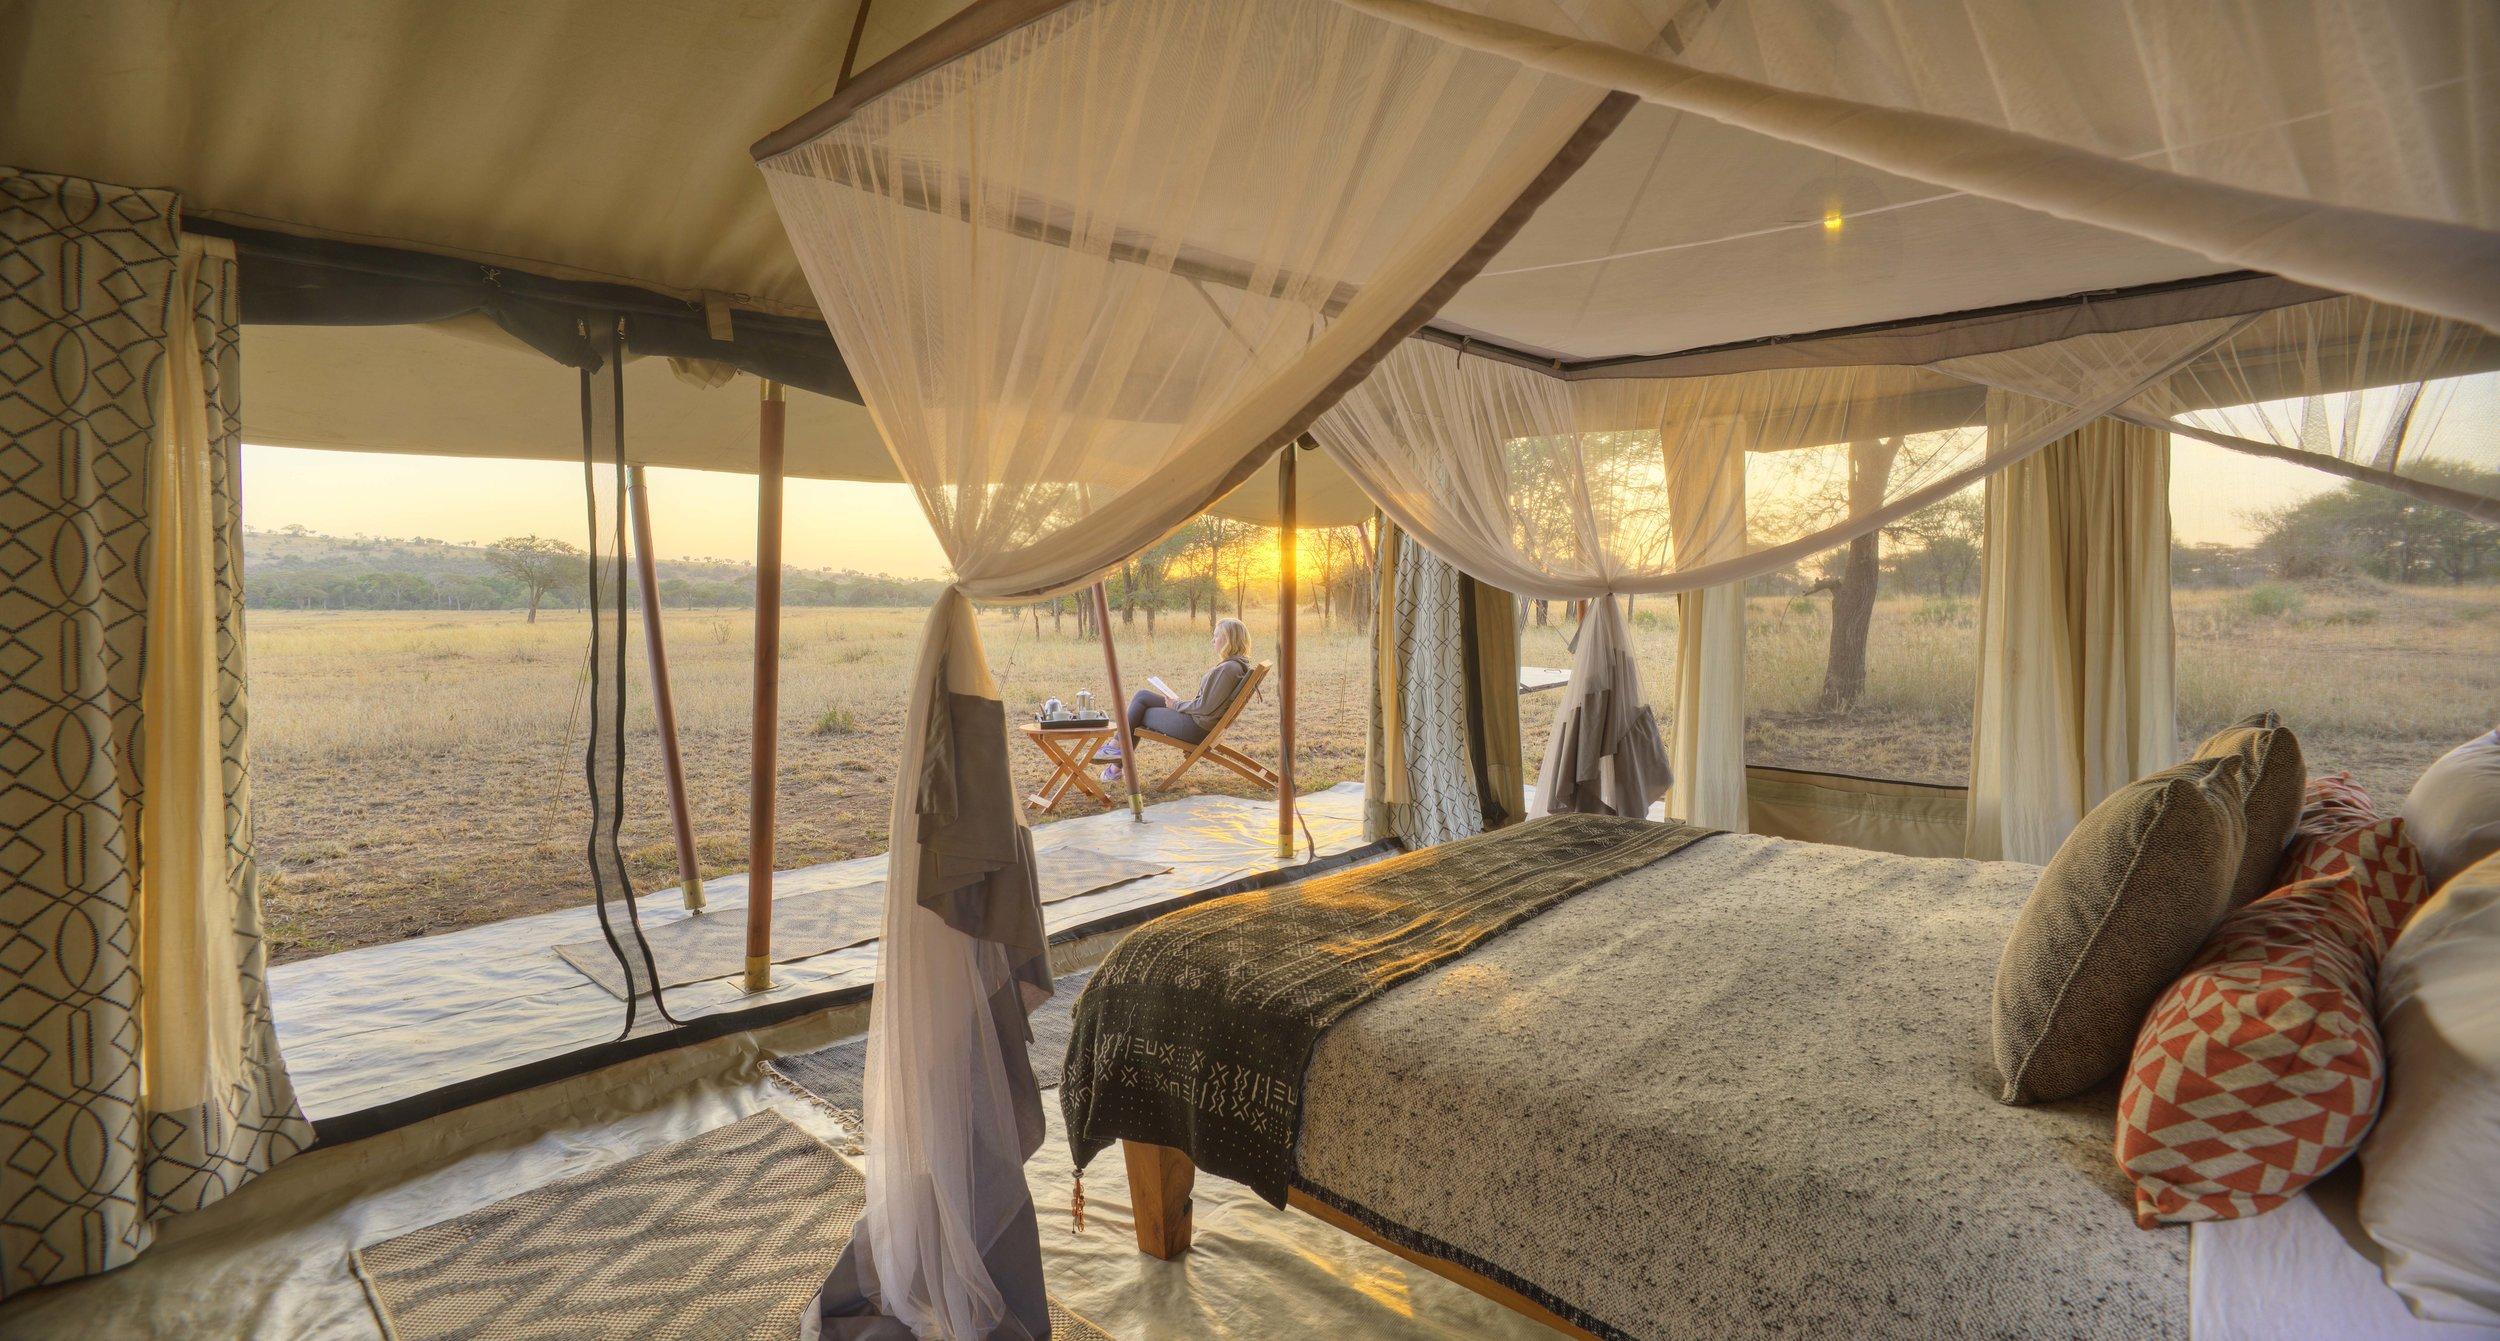 ubuntu-camp-guest-tent-interior-(1).jpg